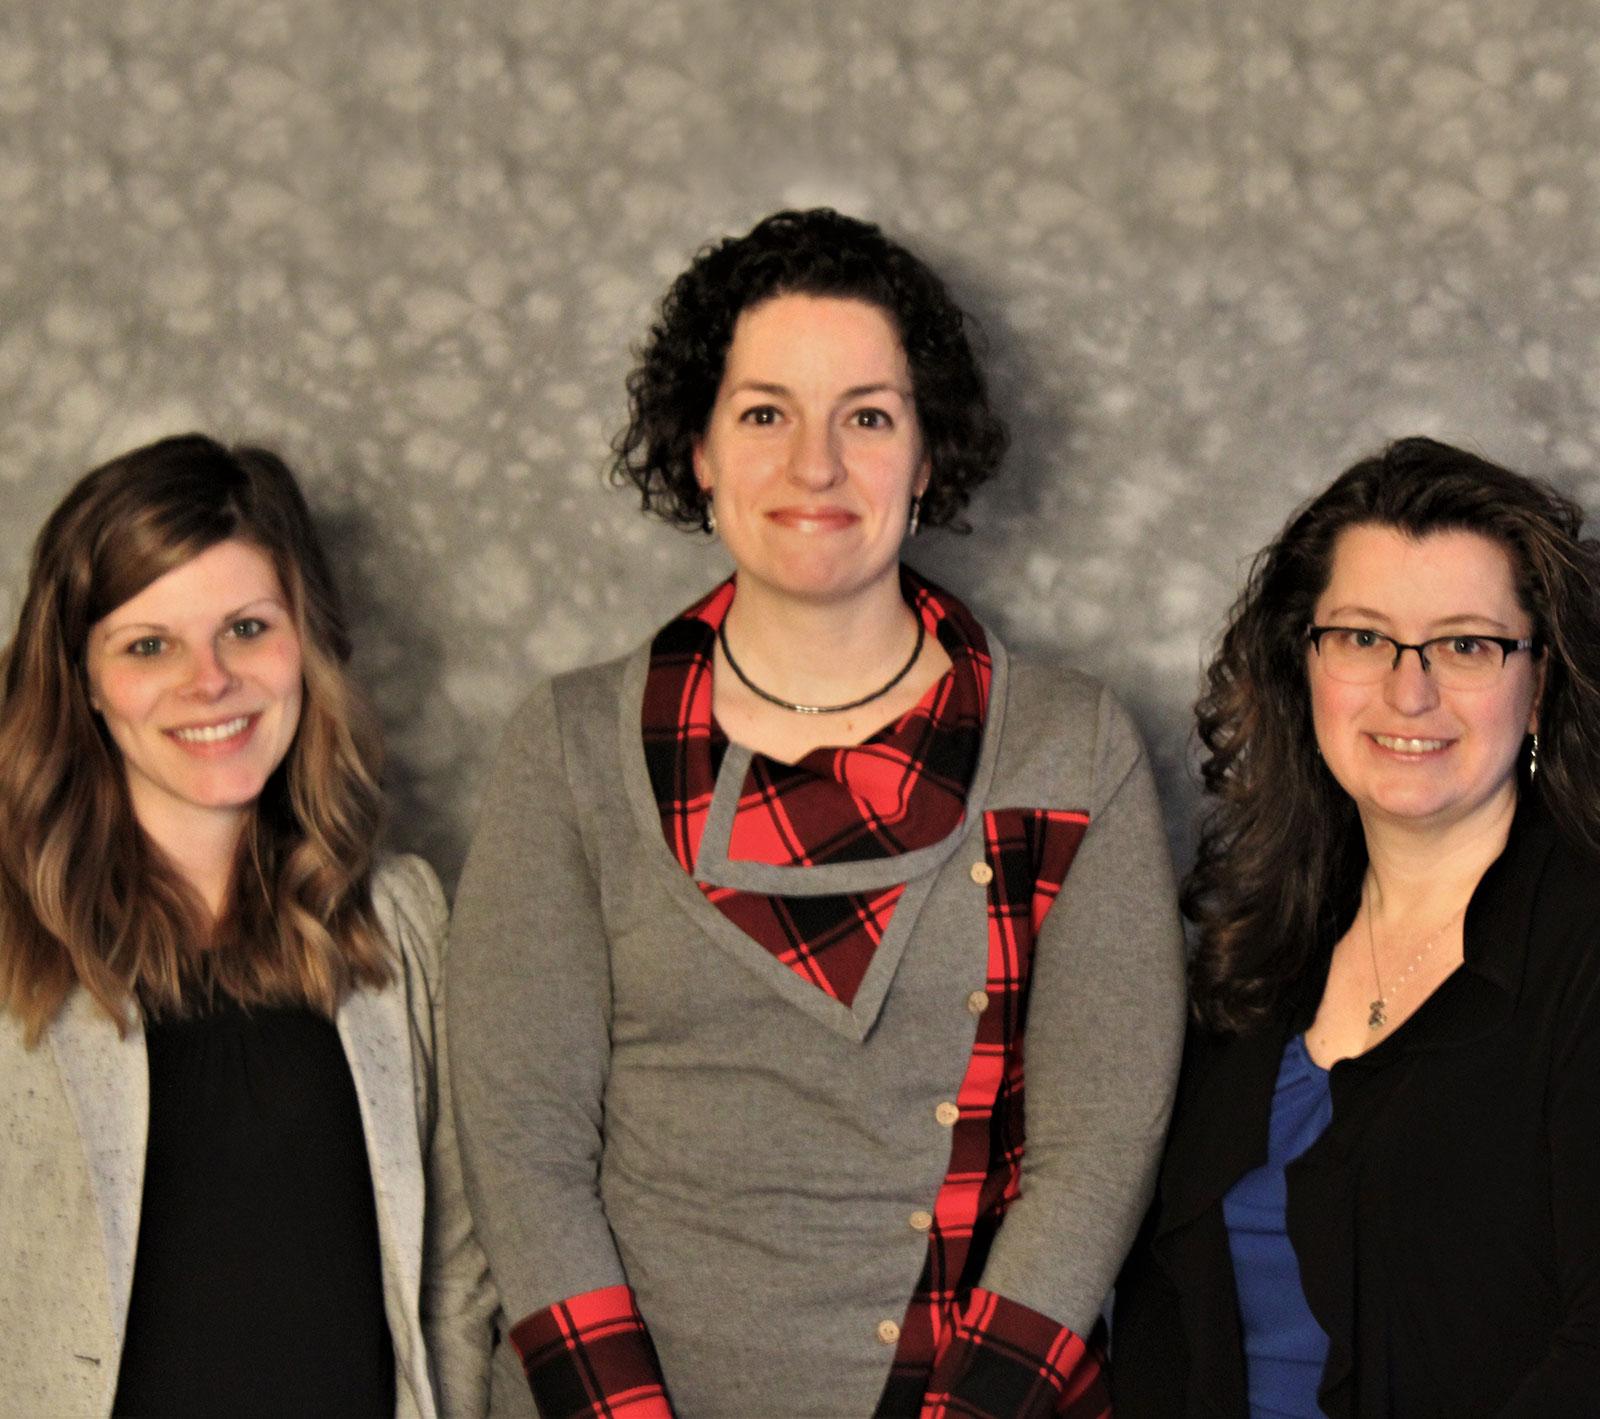 Staff: Caitlin Mullally, Laura Morse, and Samantha Eisentraut